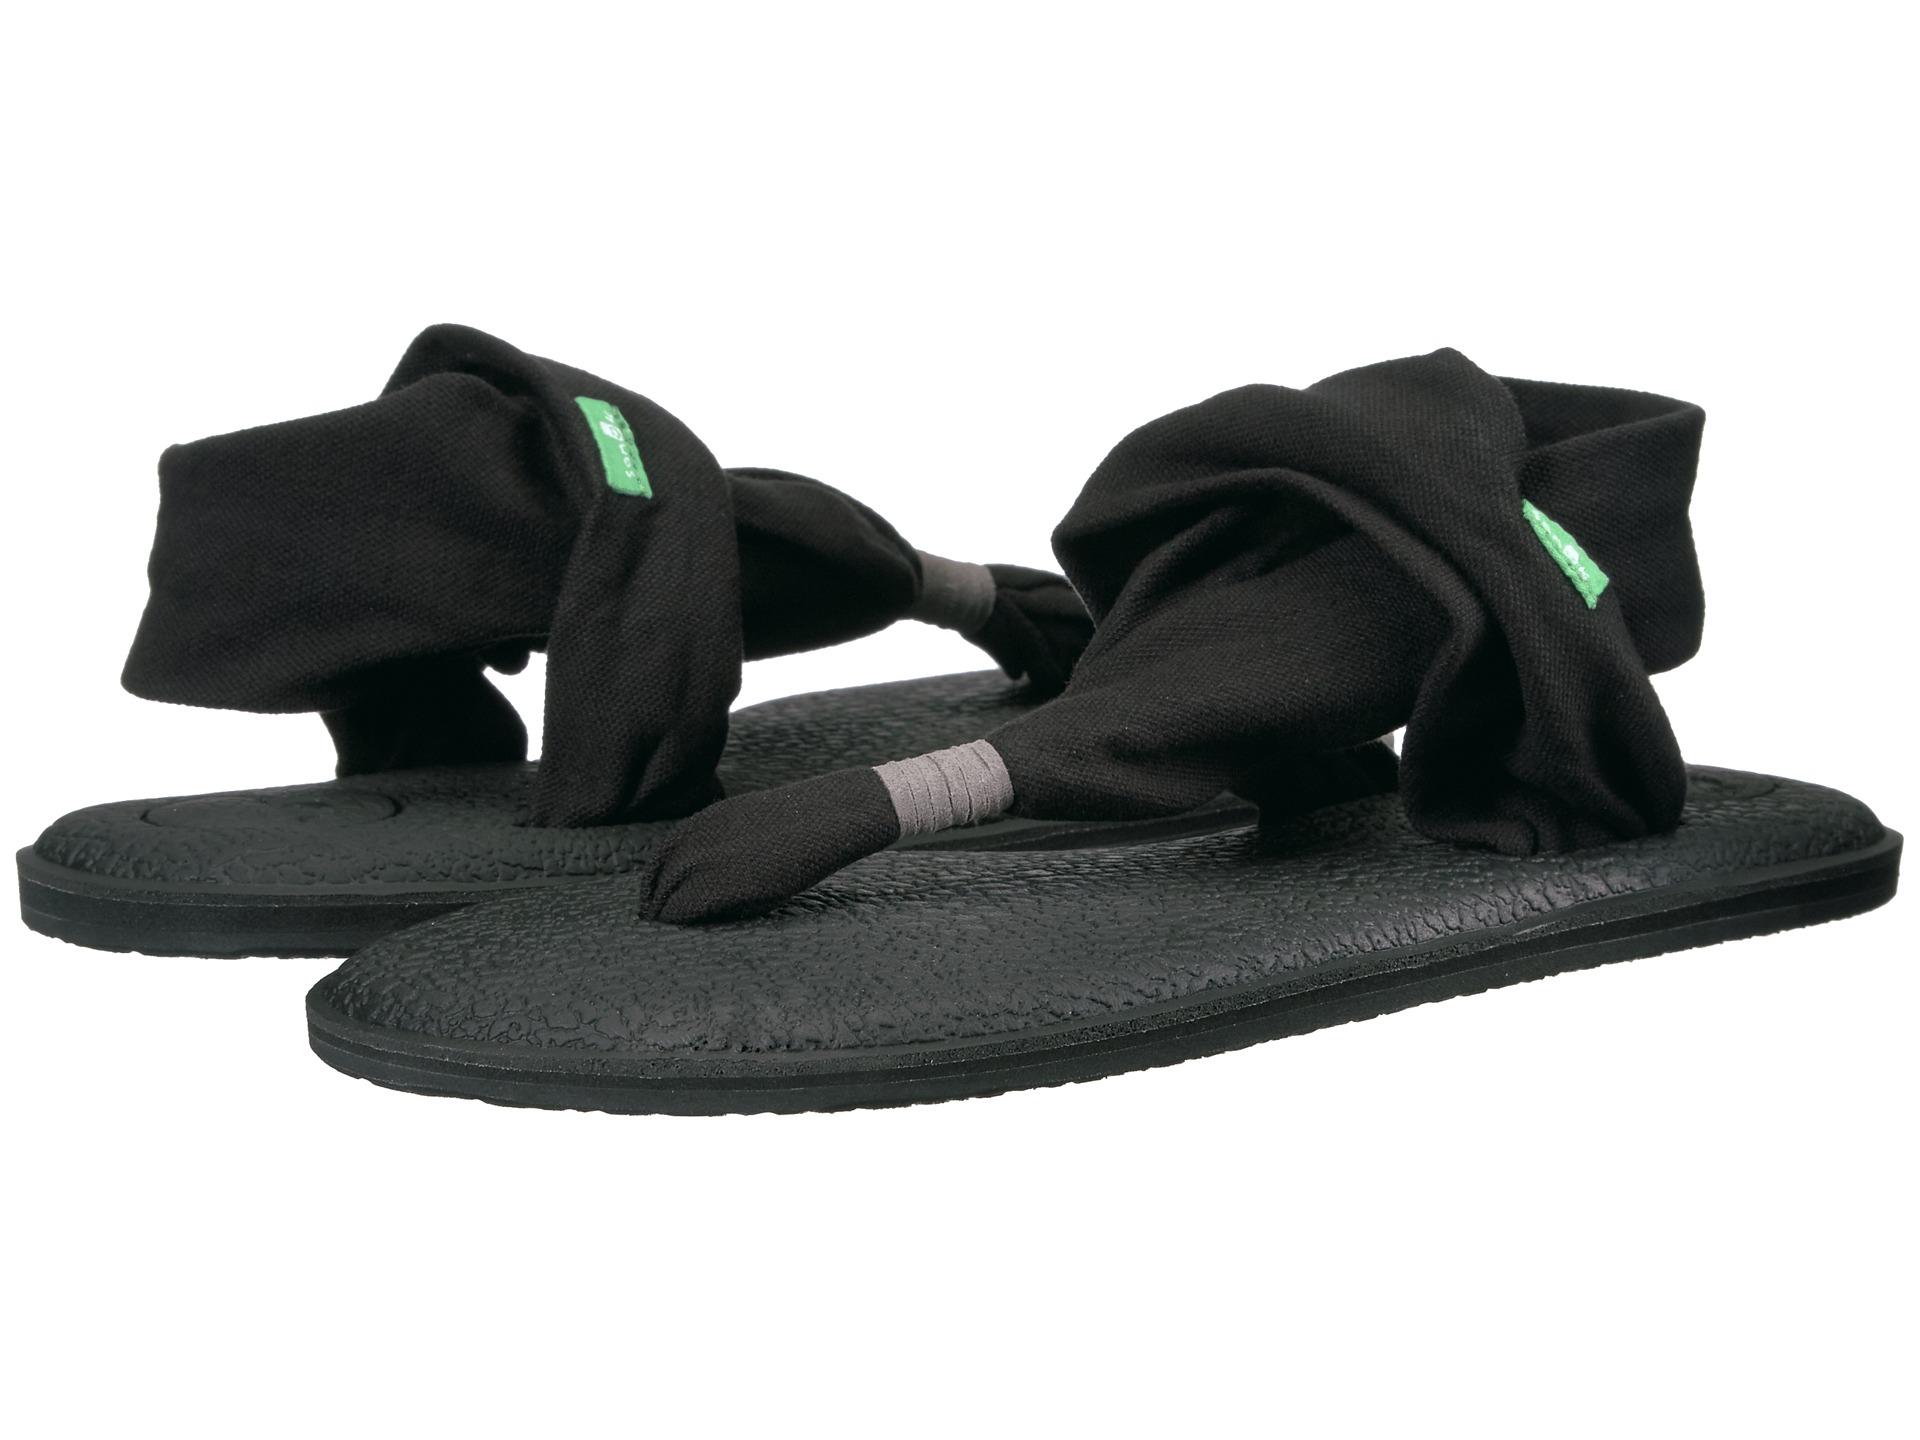 6b99da370 Beaded Sandals  Zappos Yoga Shoes